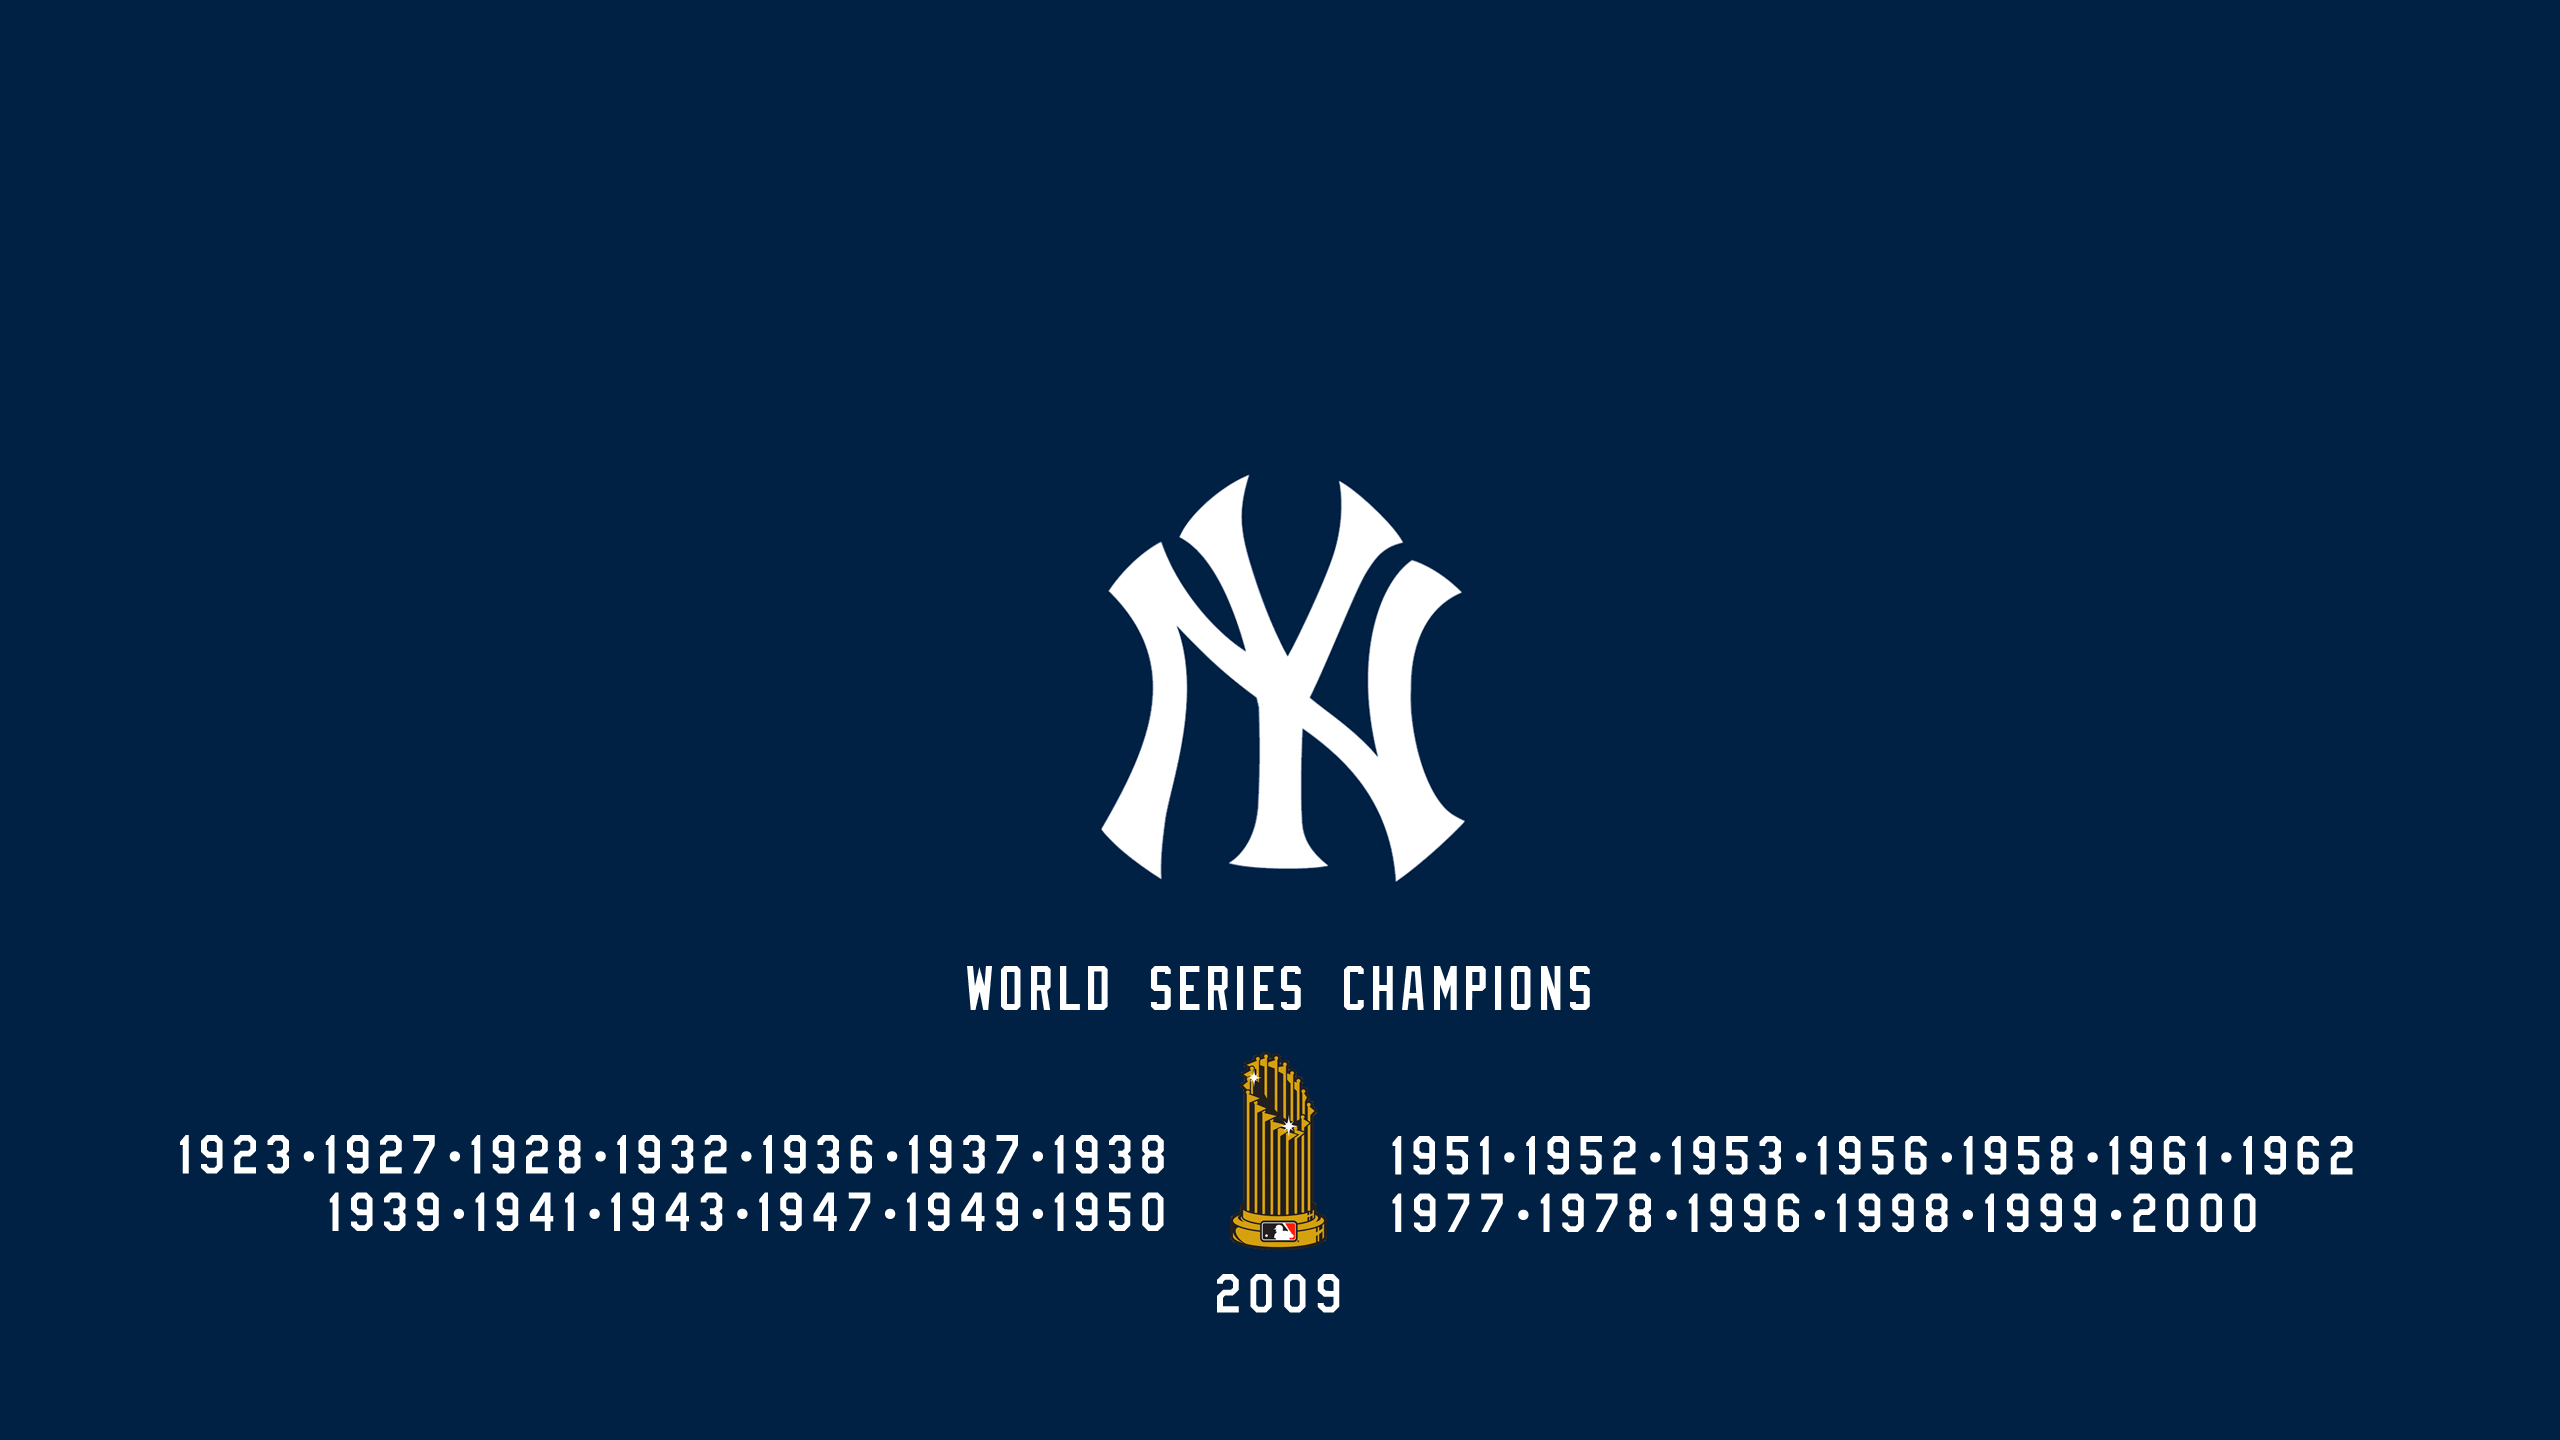 New York Yankees - World Series Champs